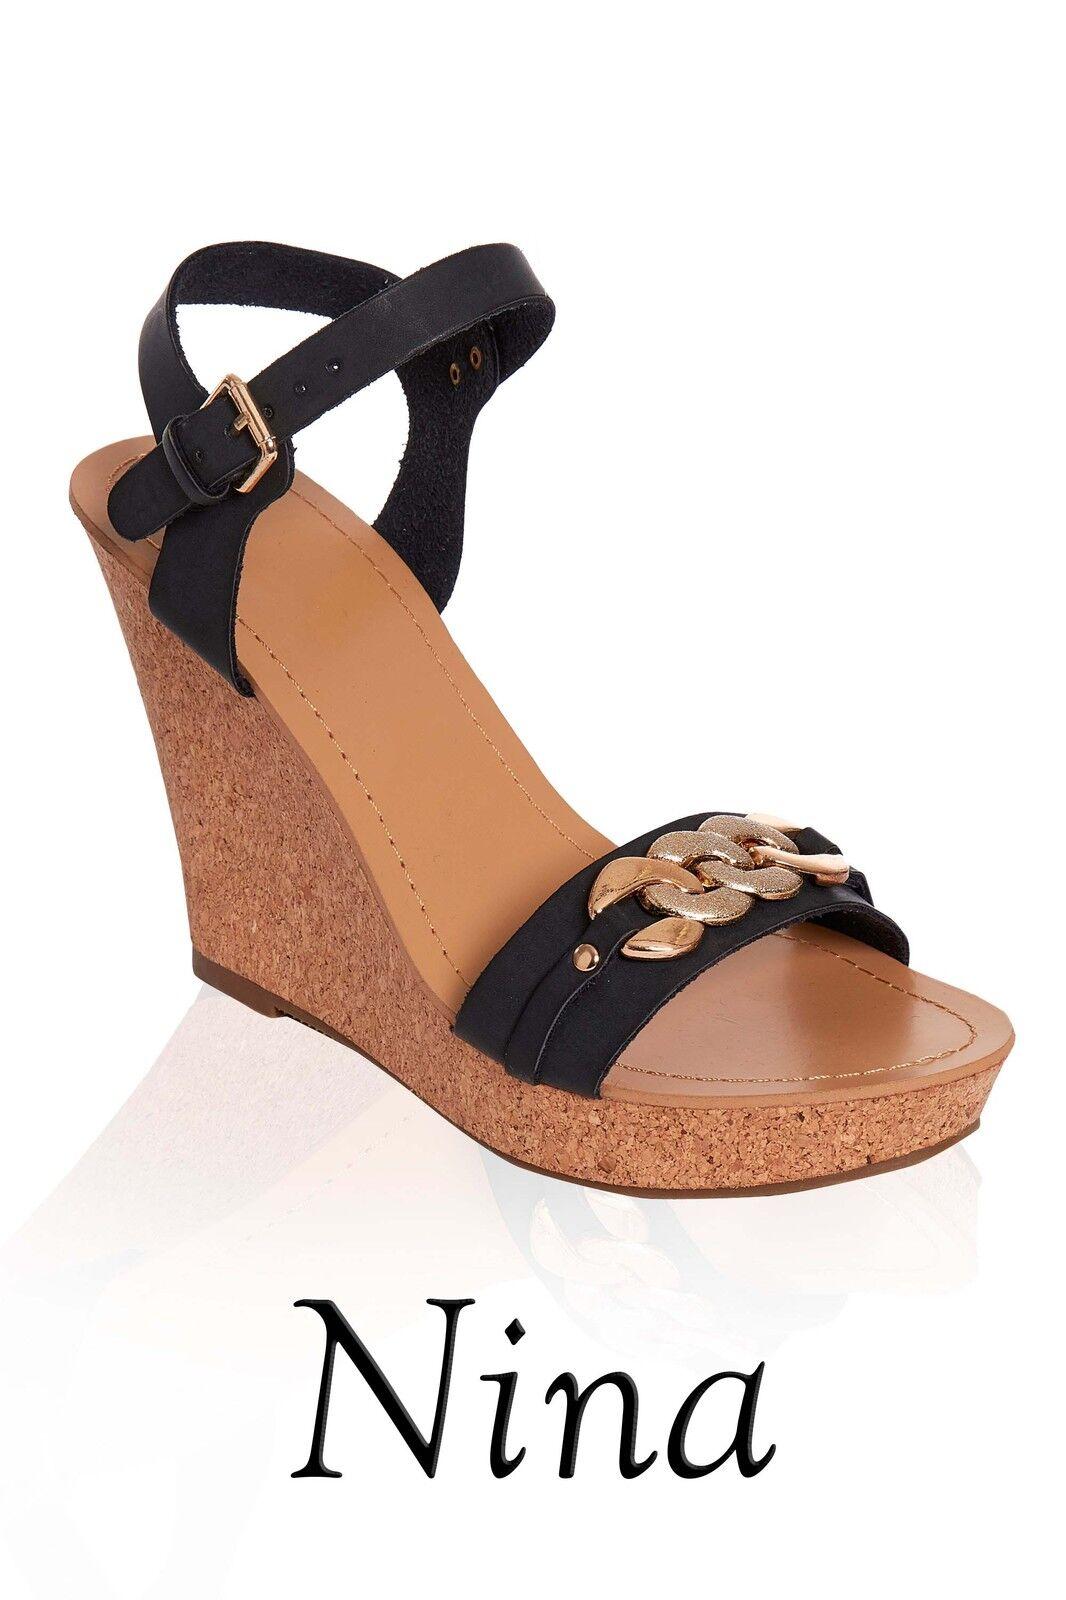 Ladies Womens Designer Style shoes Cork Sandals Black High Heel Cork shoes Wedge Sandal dba3aa